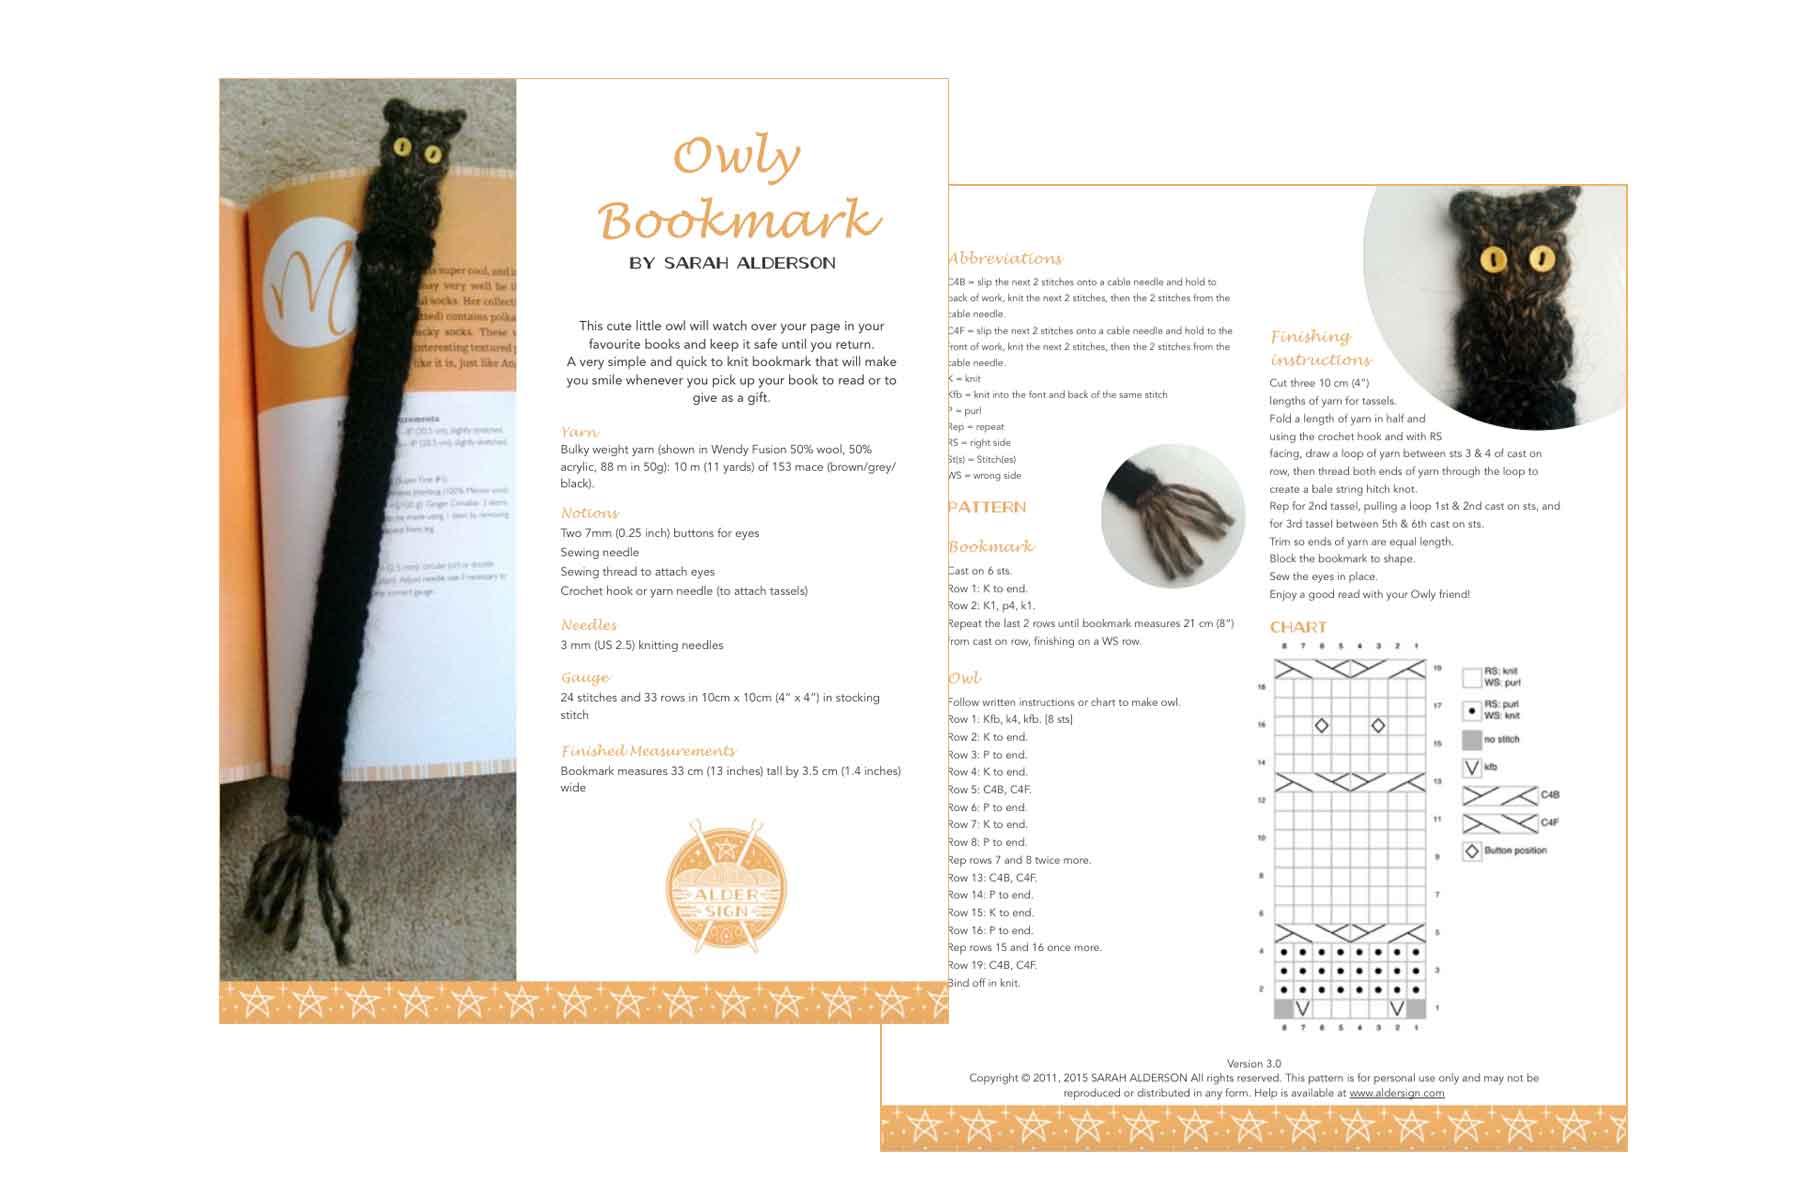 Owly-Bookmark-pdf-layout-web.jpg